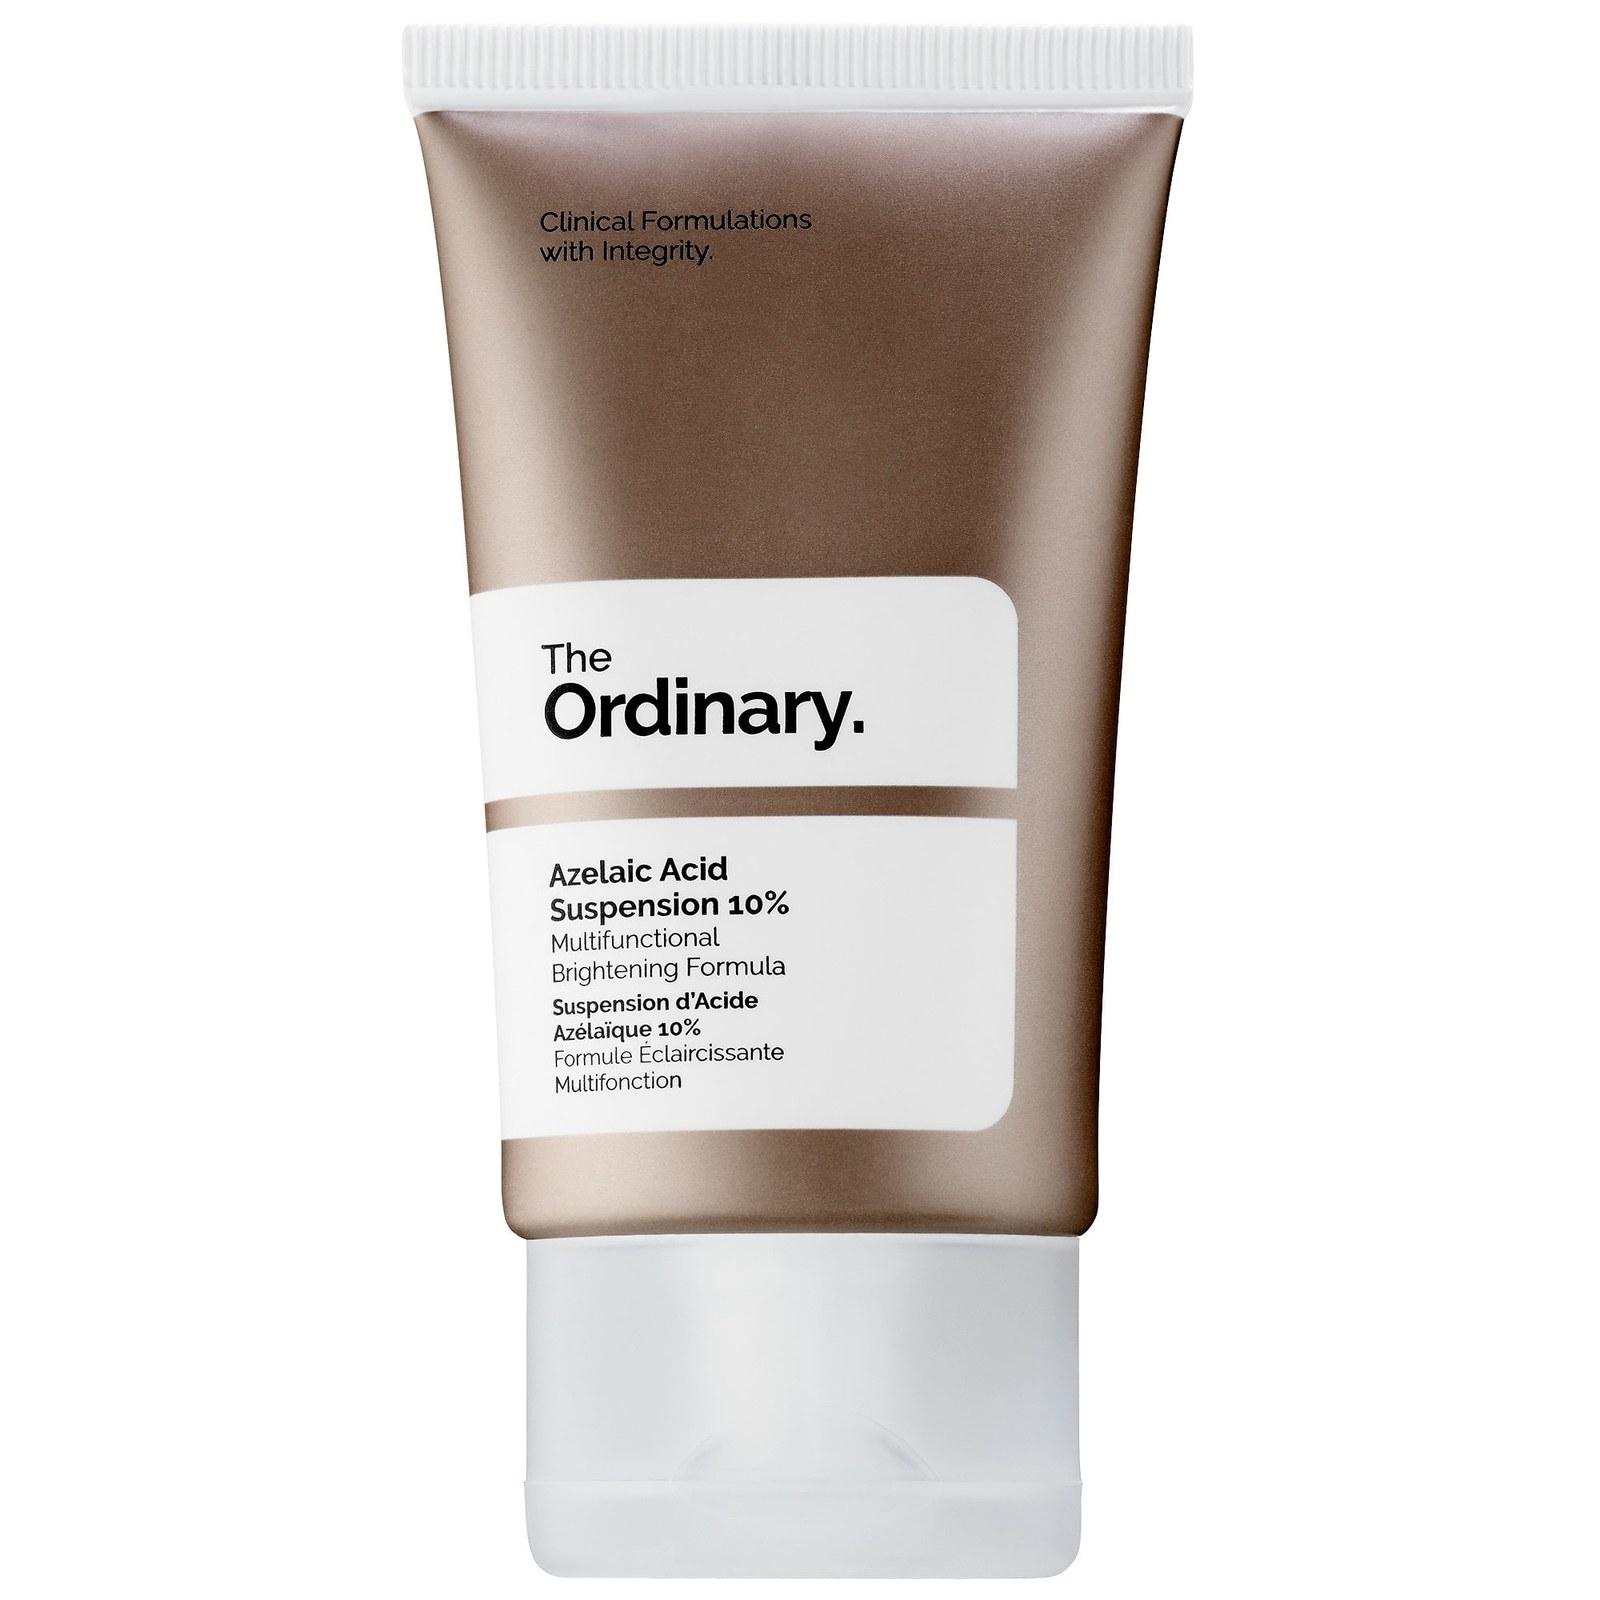 The bottle ofThe Ordinary's Azelaic Acid Suspension 10%